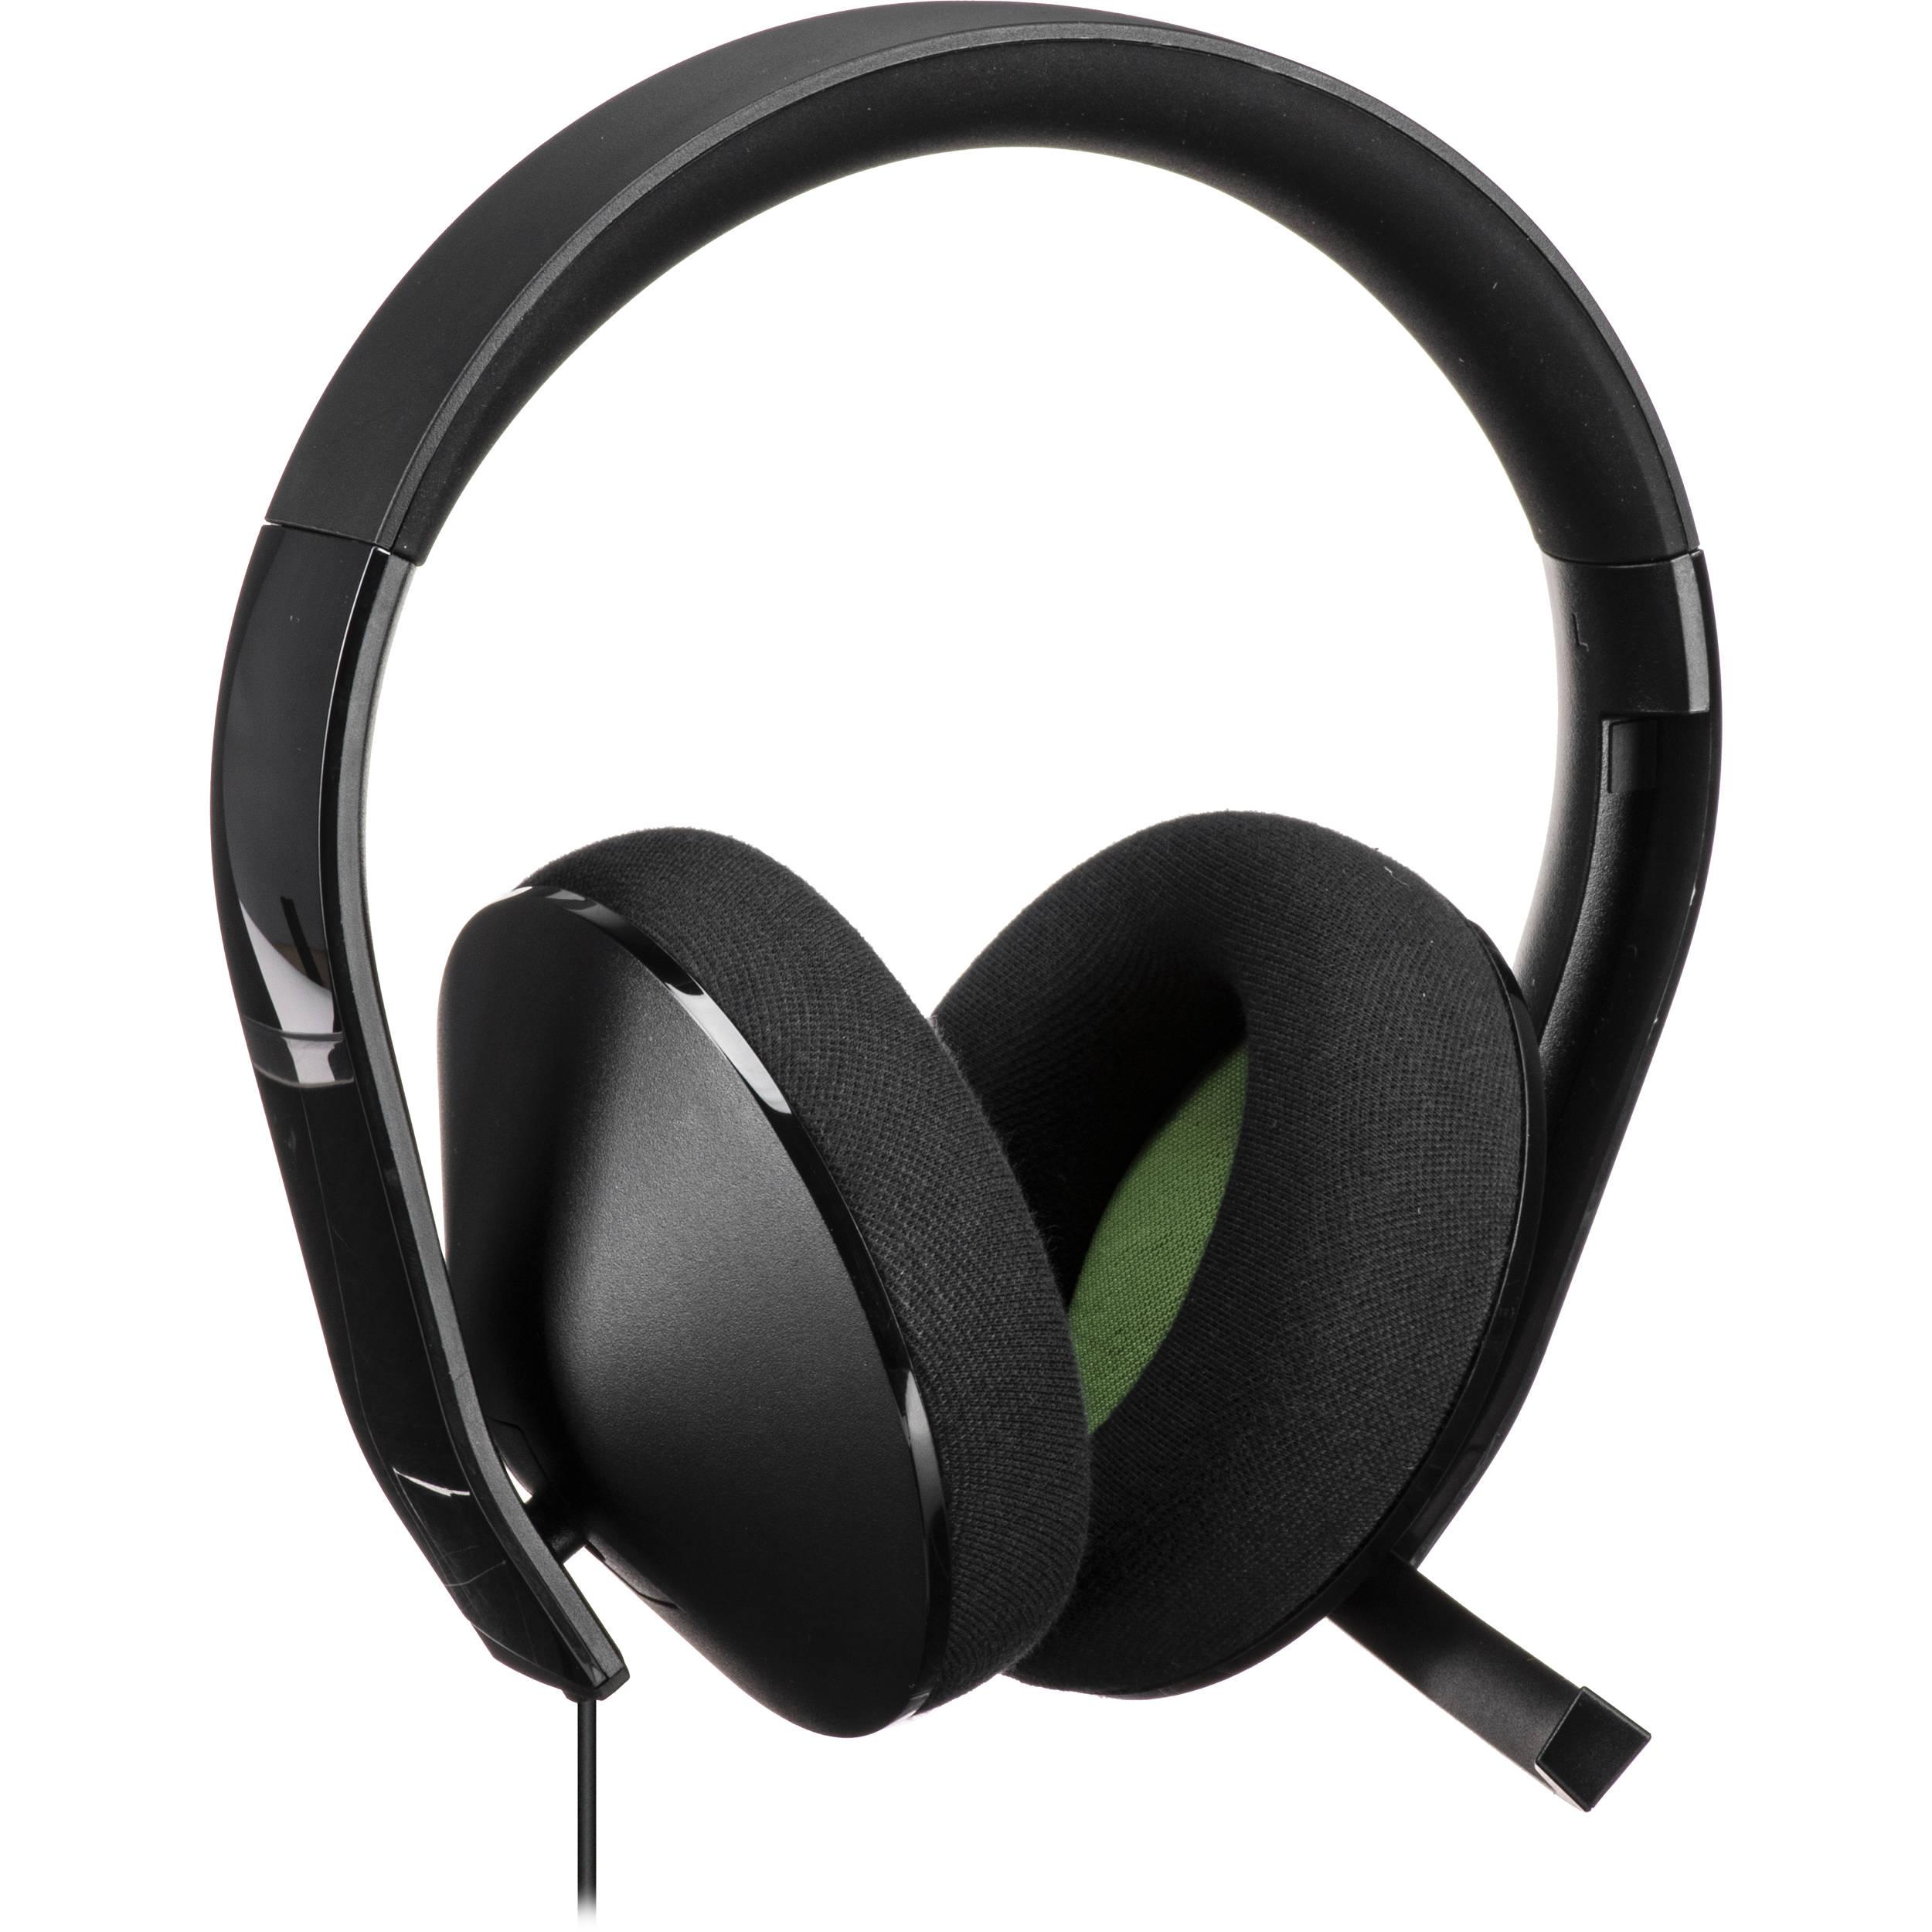 2f04f91b665 Microsoft Xbox One Stereo Headset S4V-00012 B&H Photo Video